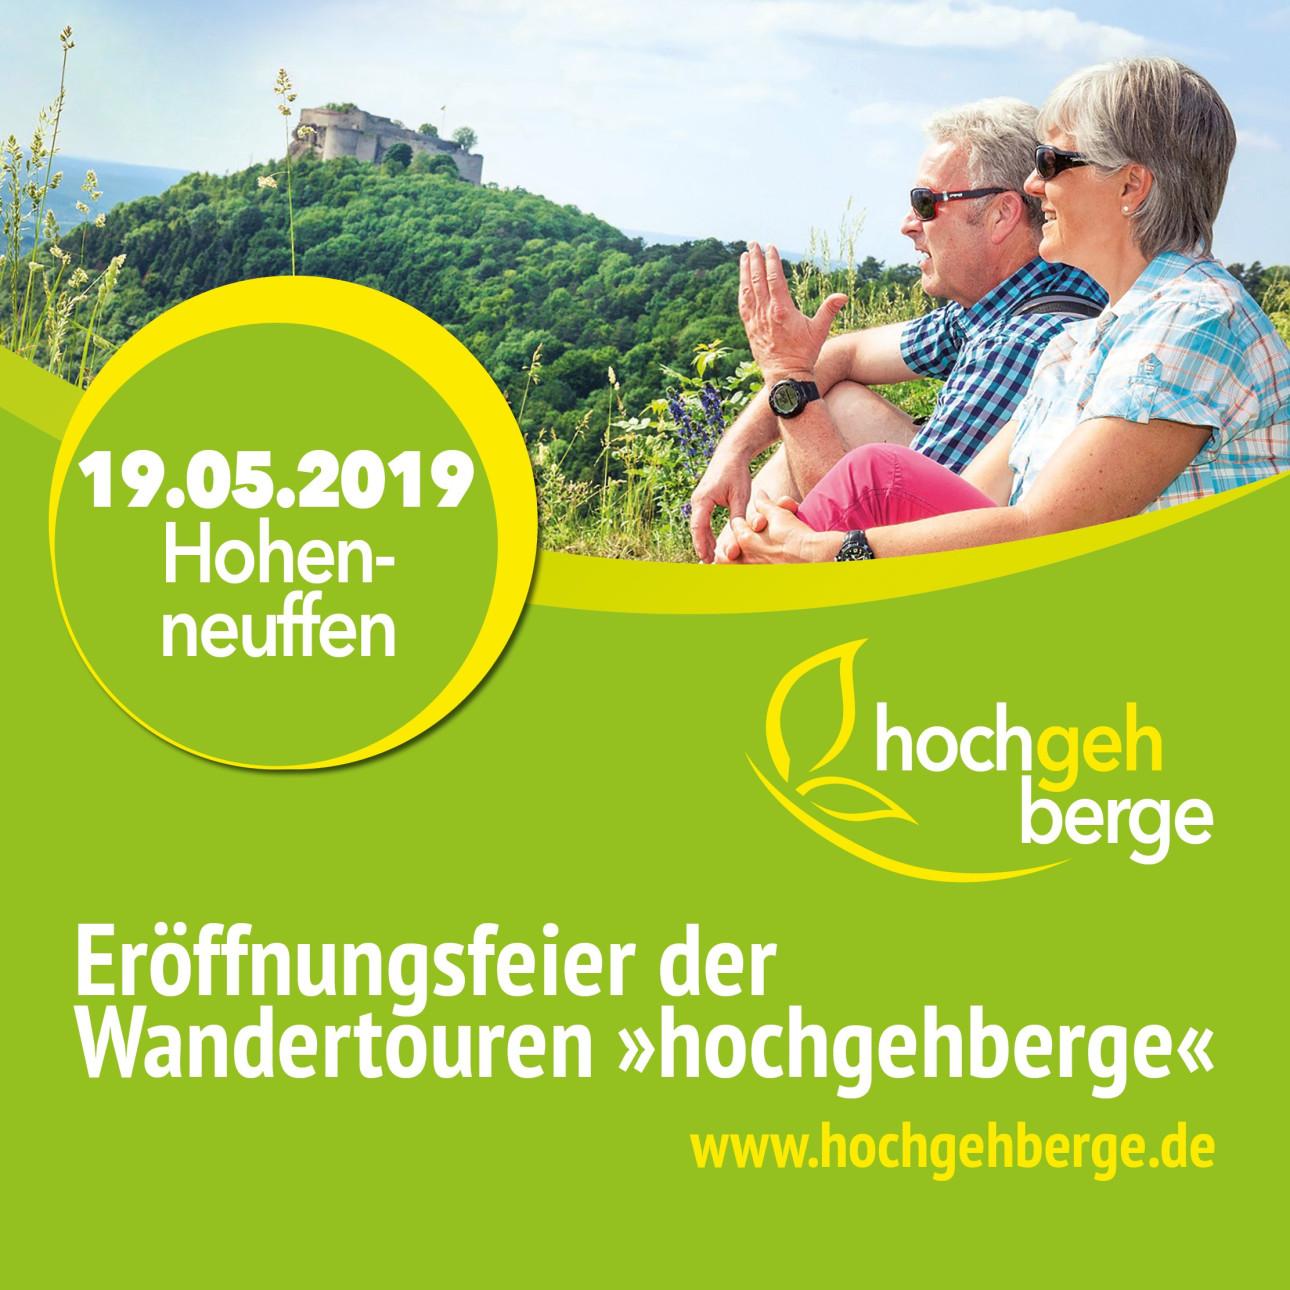 "Eröffnungsfeier der Wandertouren ""hochgehberge"""